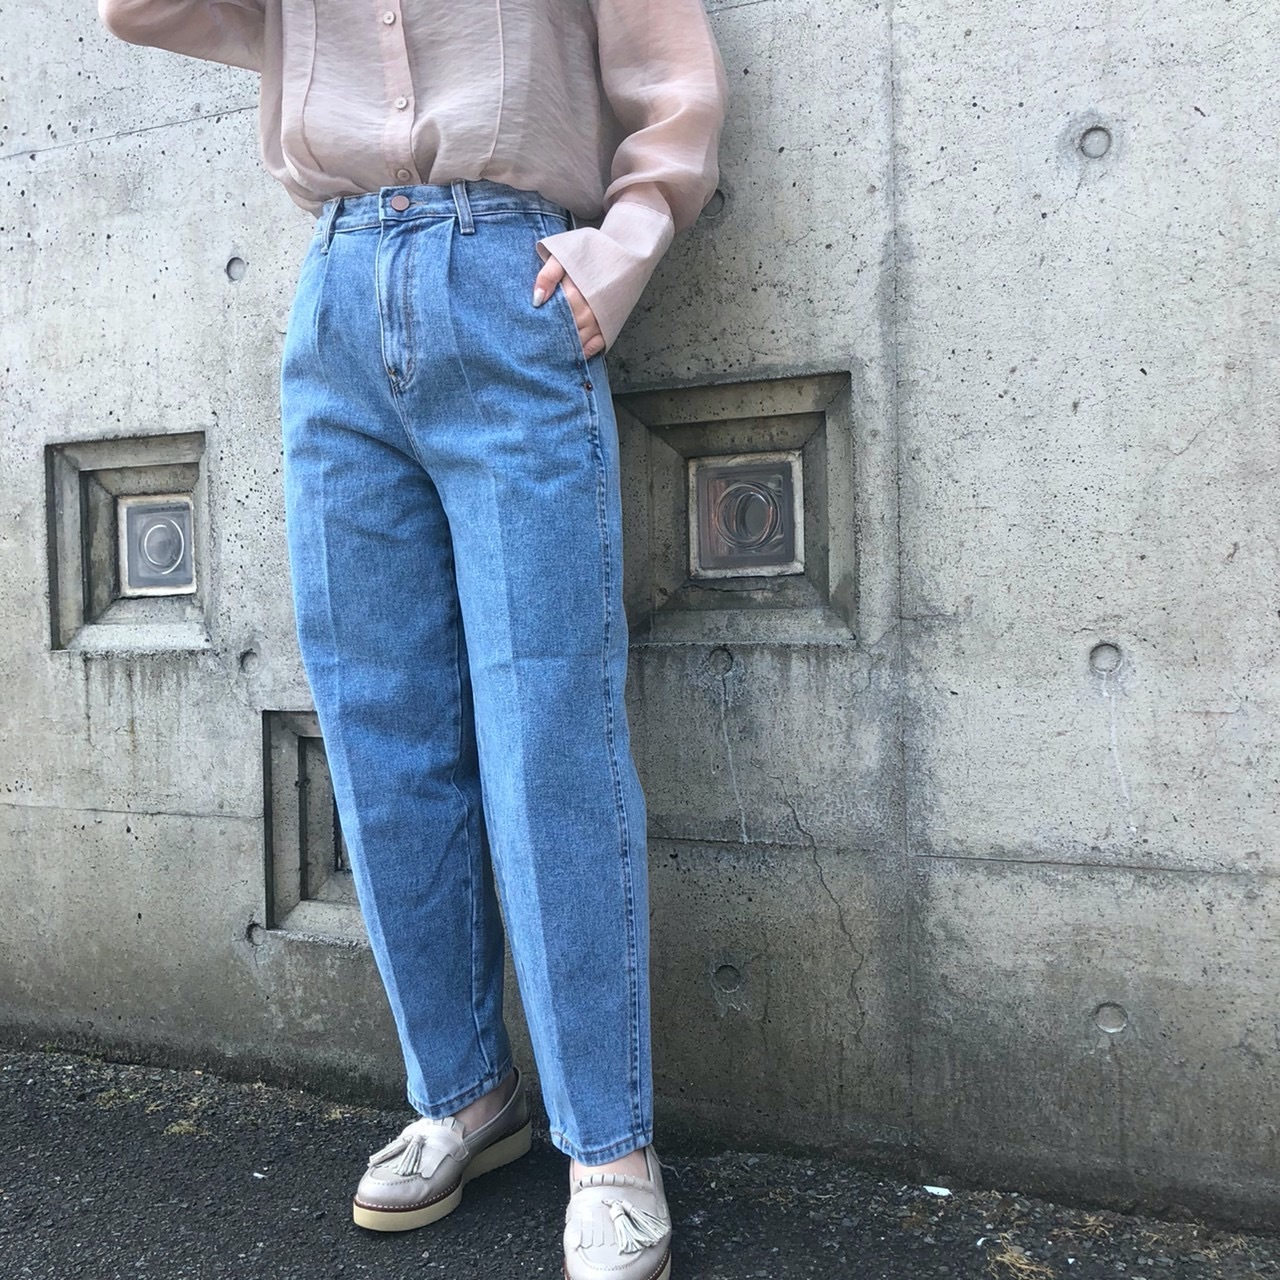 【 Days 】- 110-3217 - タックデザインデニム